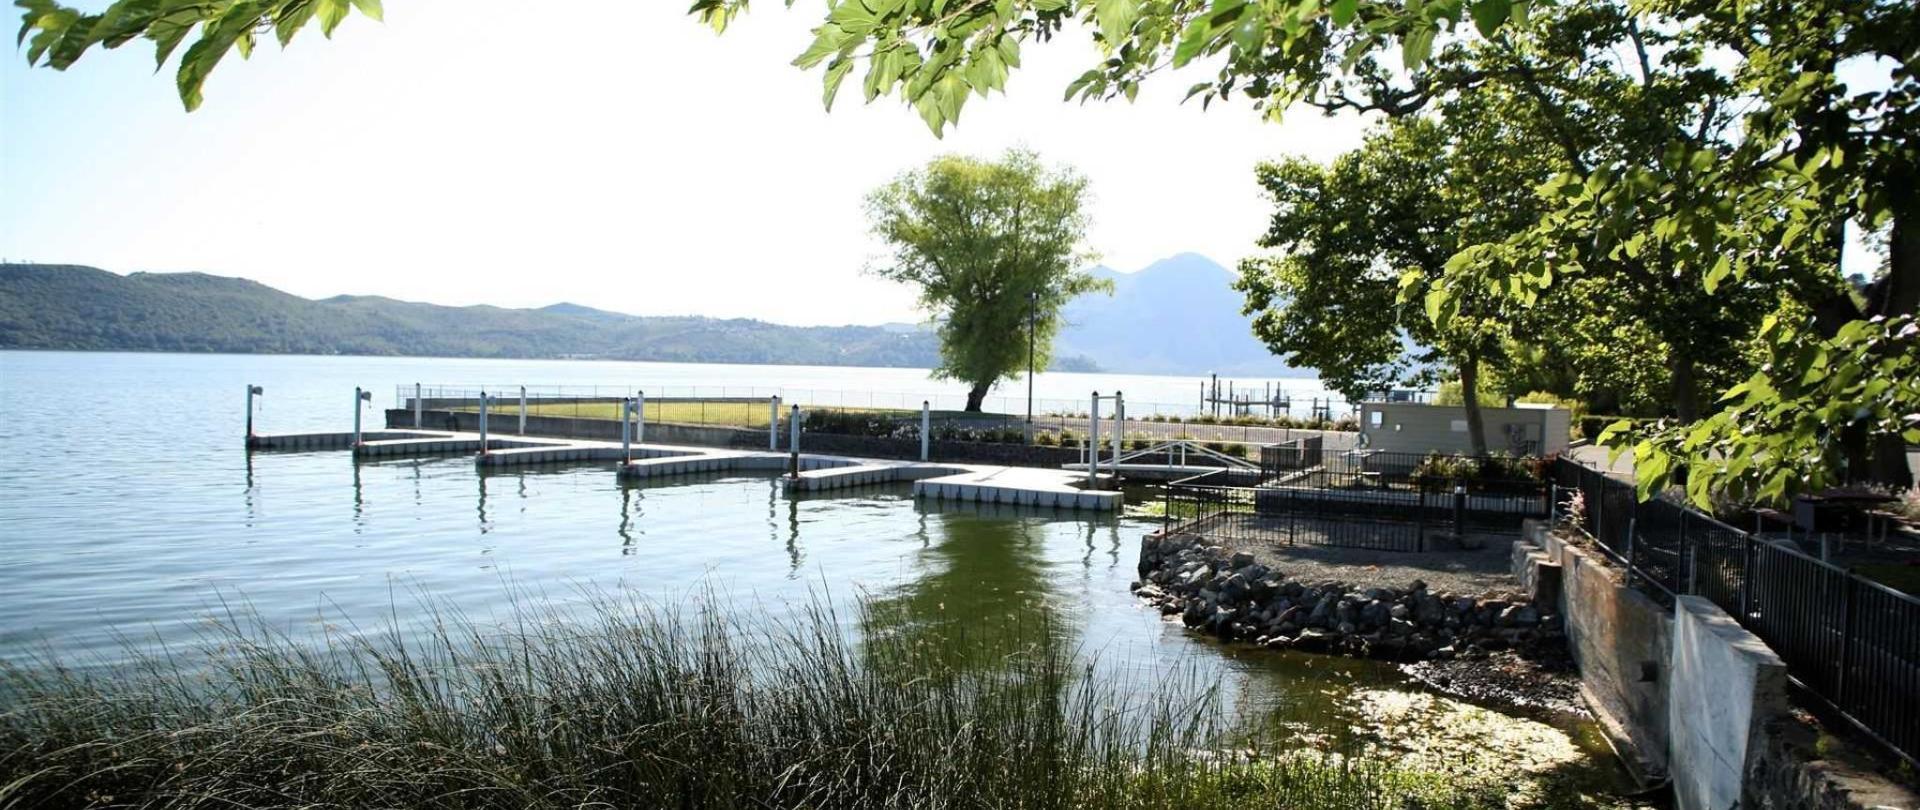 Clear Lake California Hotels 2018 World S Best Hotels